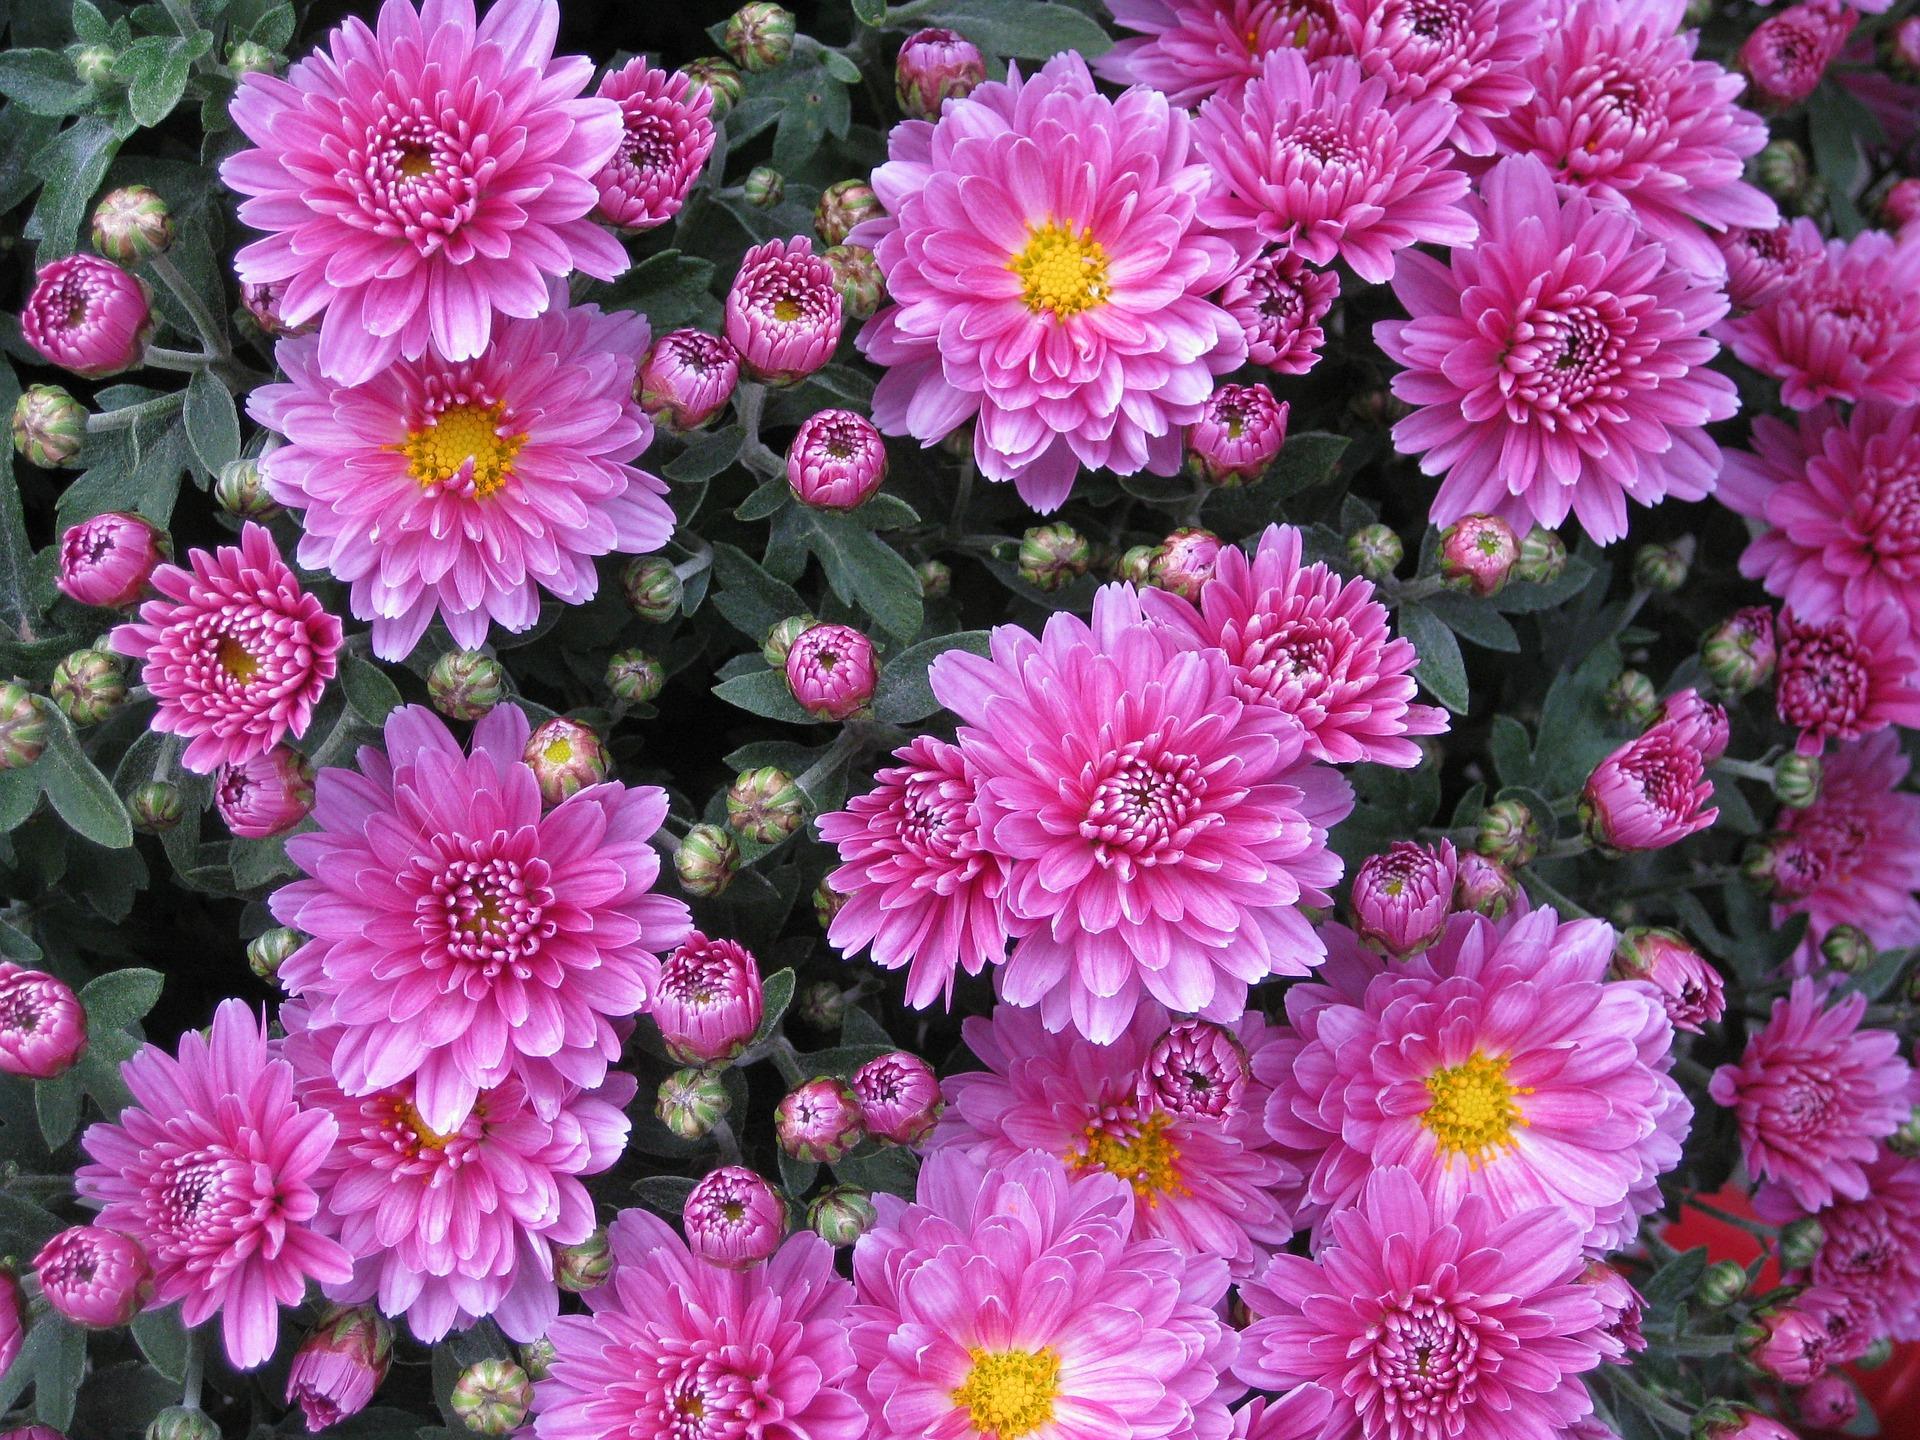 flowers 10201 1920